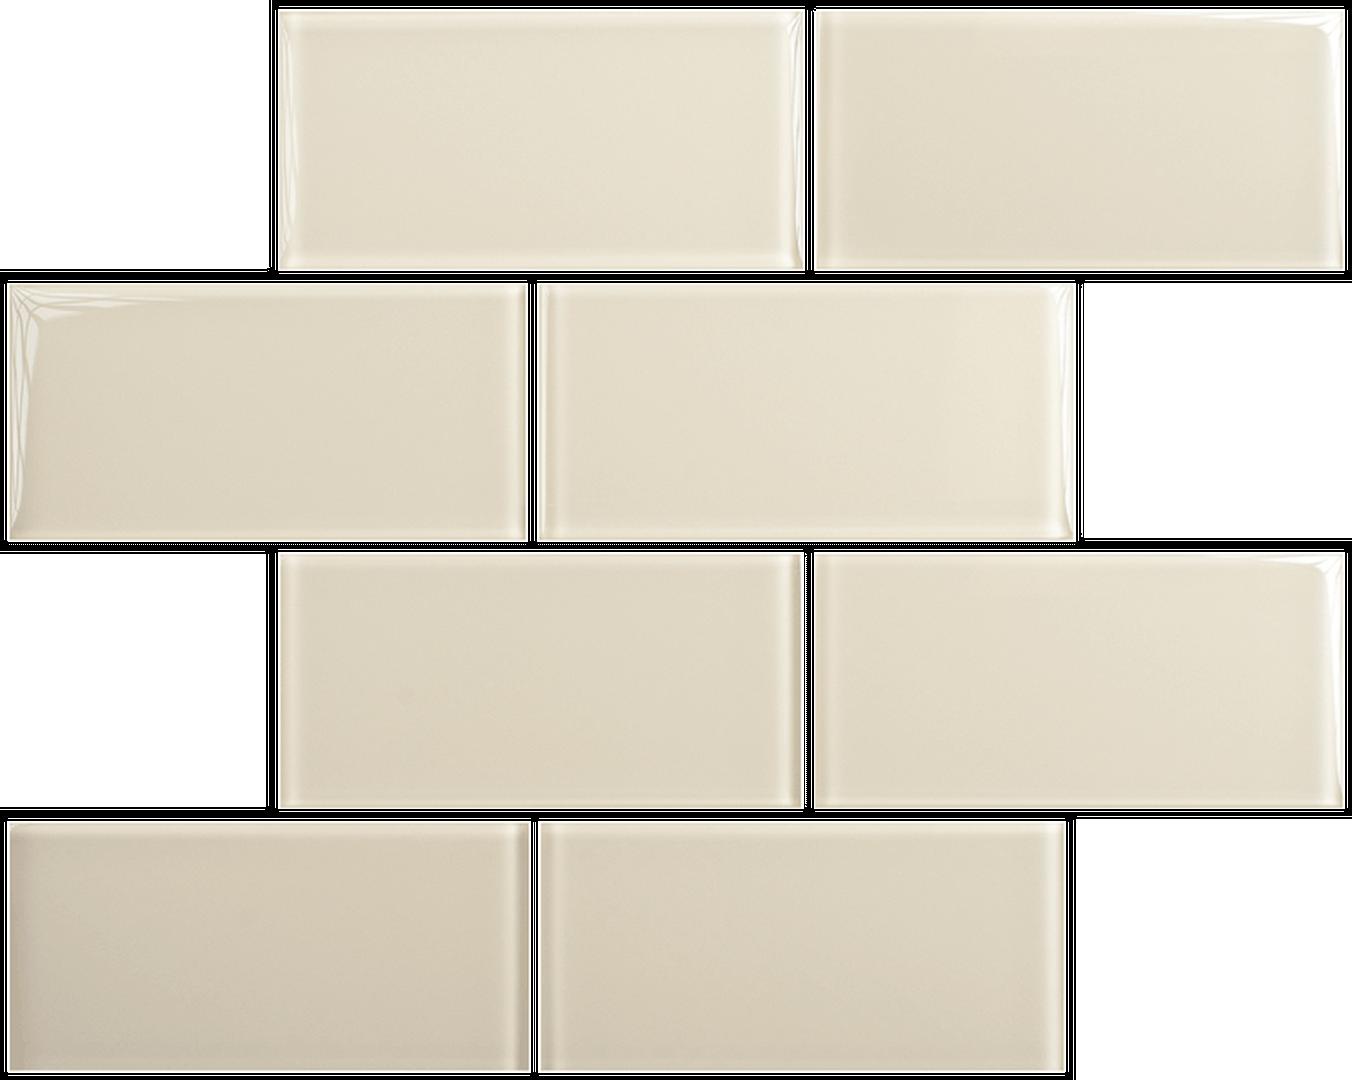 Crystal 3 x 6 Subway Tiles Ivory